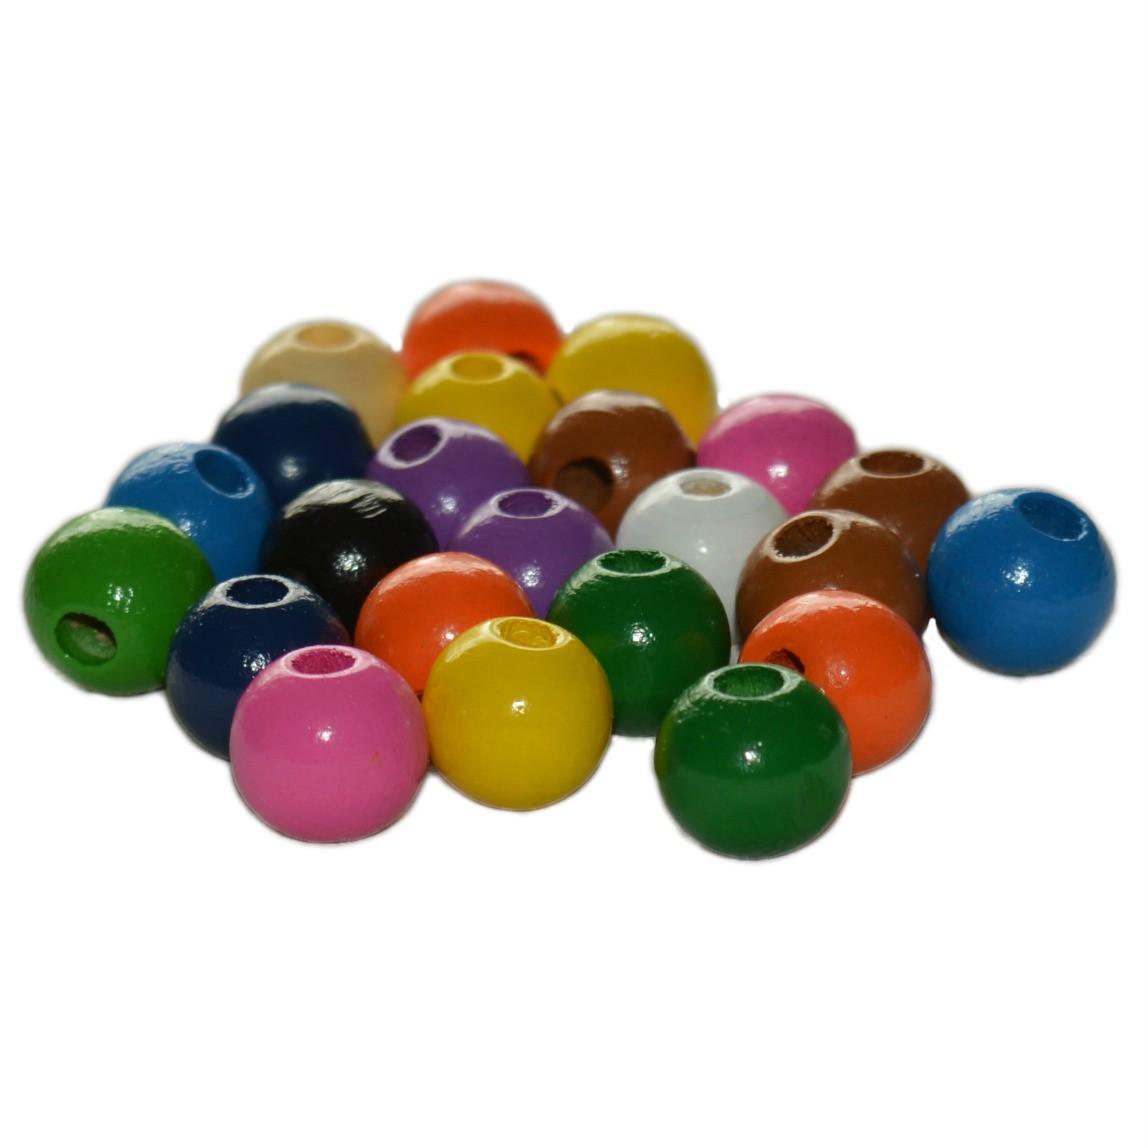 perles en bois color es enfiler diam 12mm lot de 80 env 50 gr. Black Bedroom Furniture Sets. Home Design Ideas